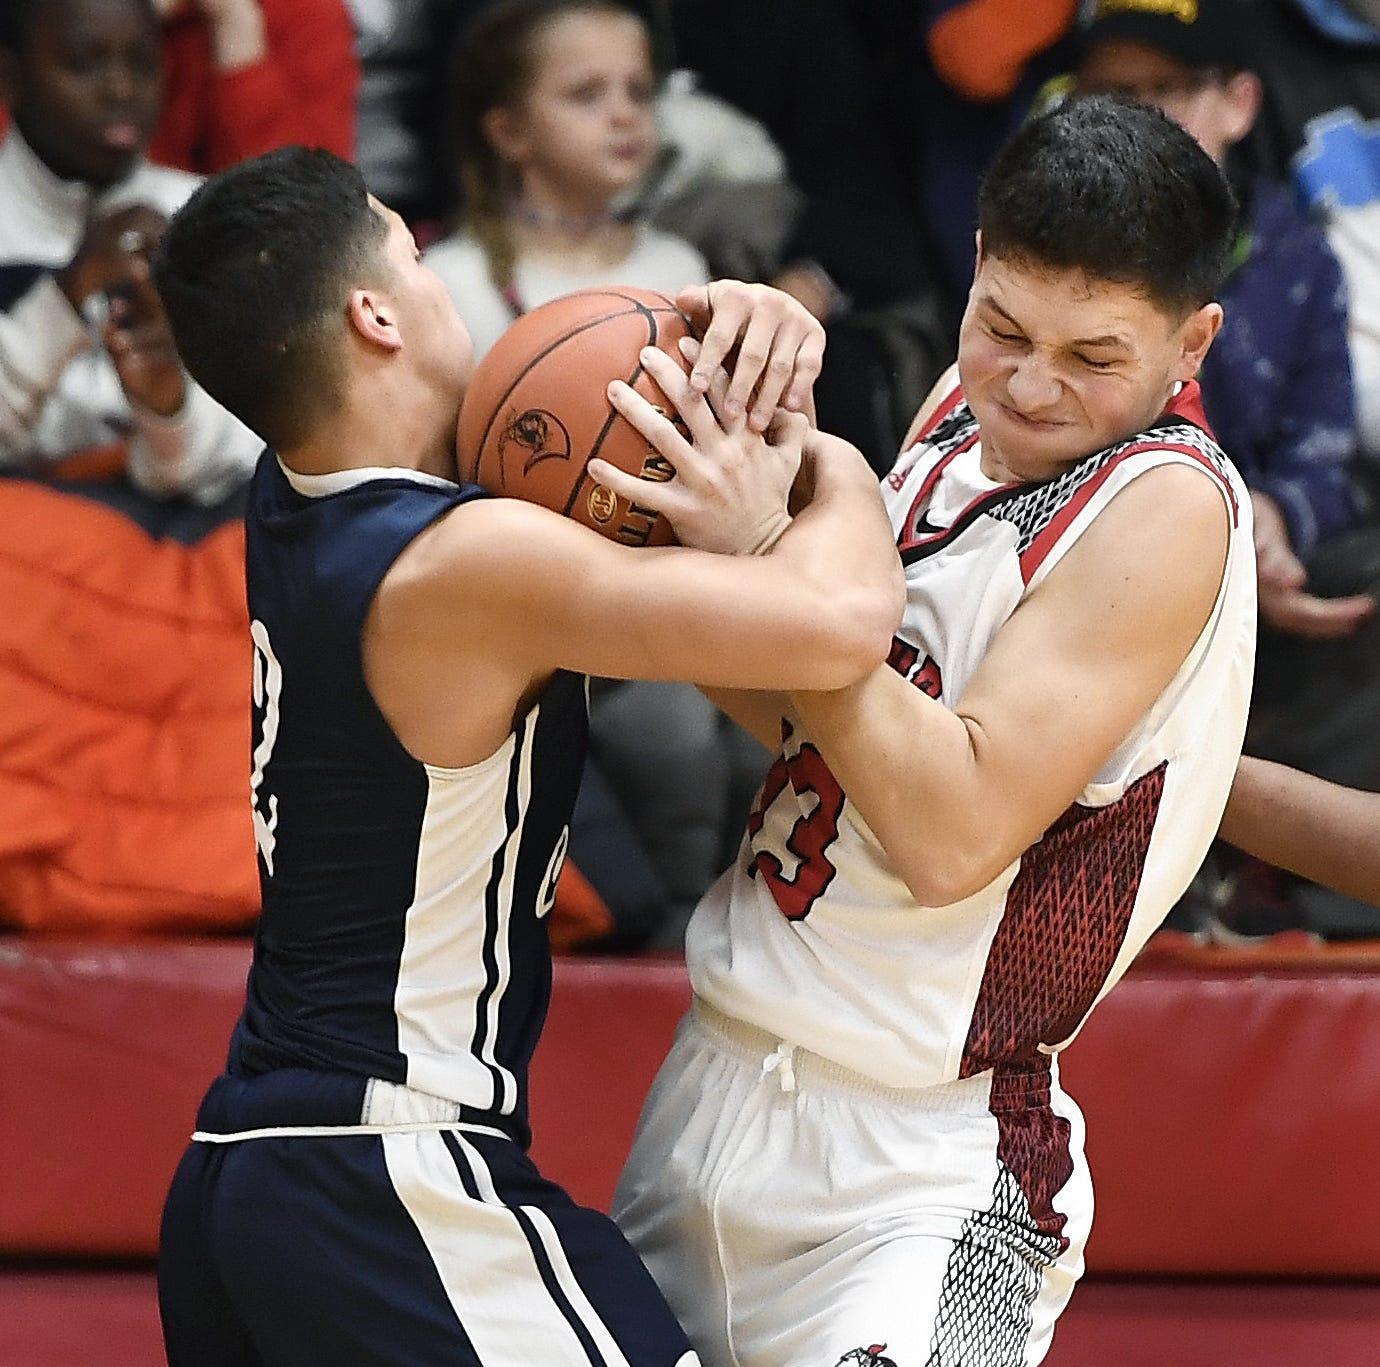 Section V high school boys basketball scores for Friday, Dec. 7